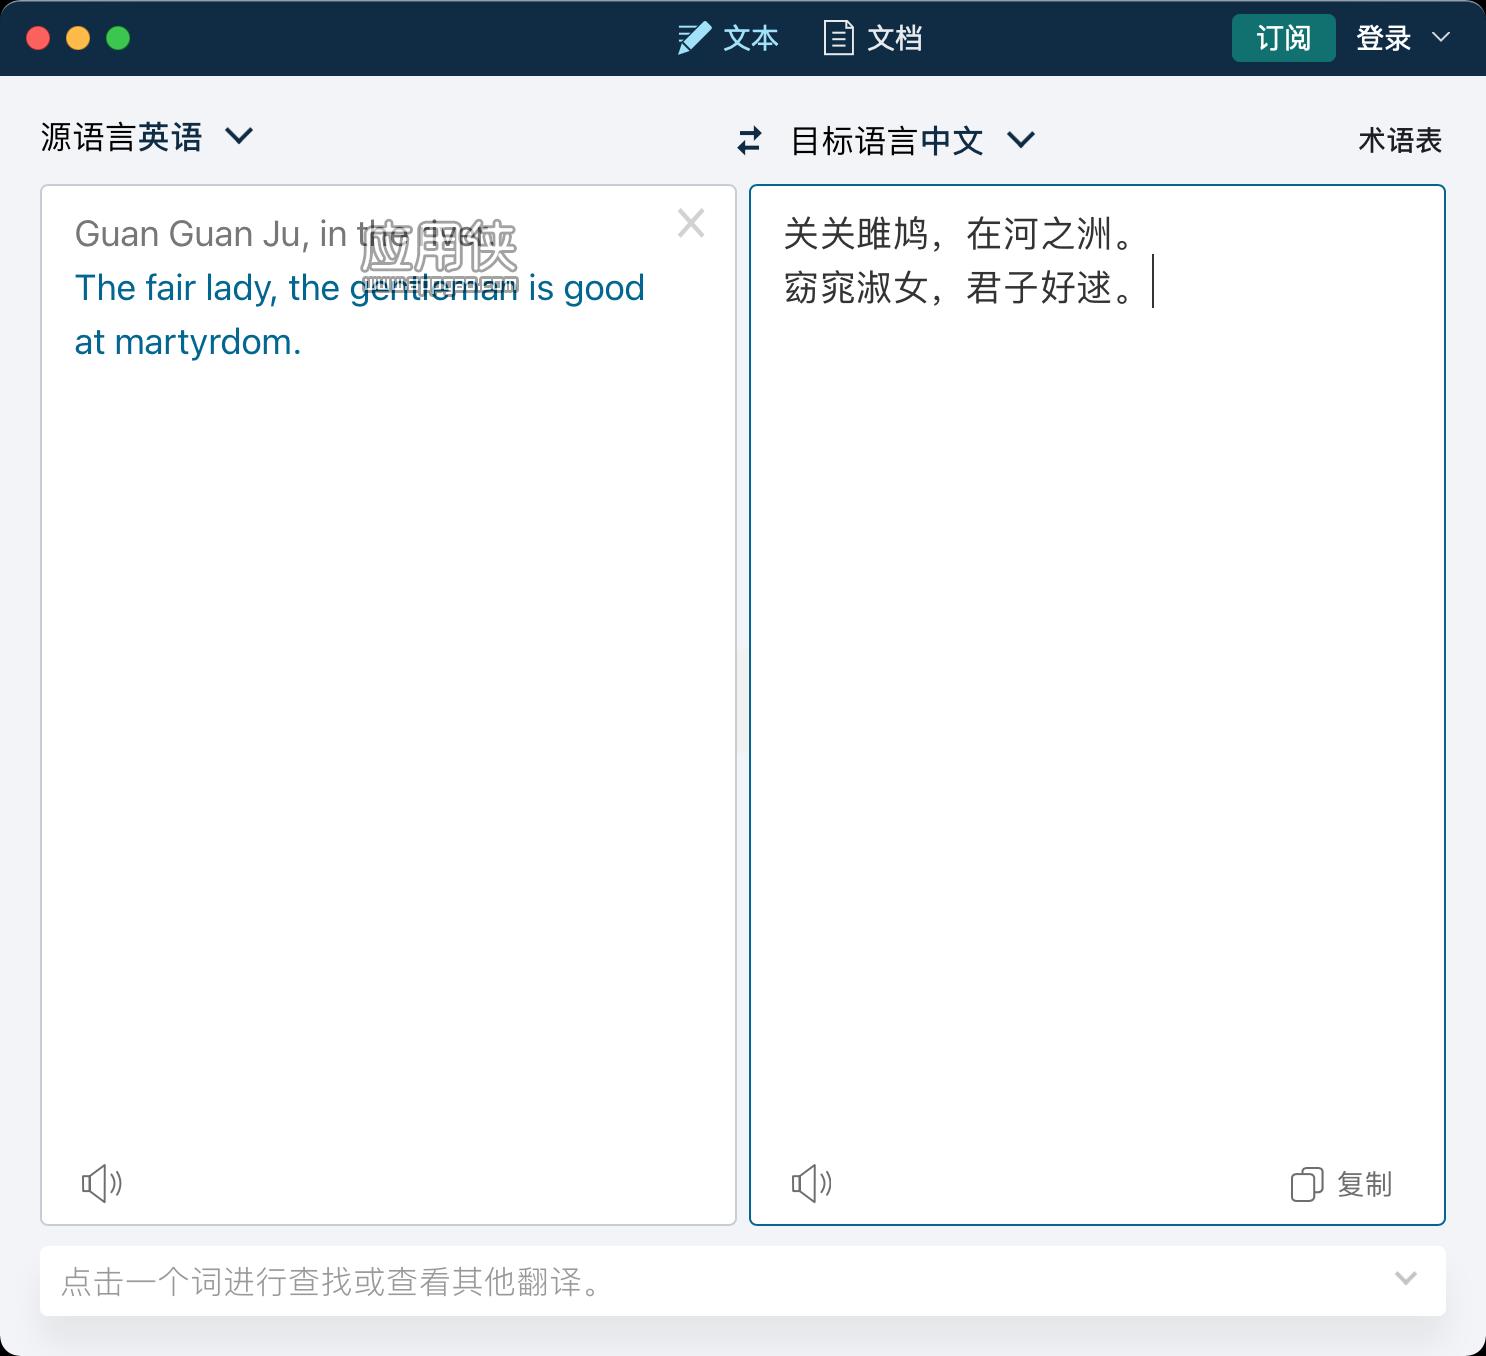 DeepL - 应用机器学习的优质翻译工具